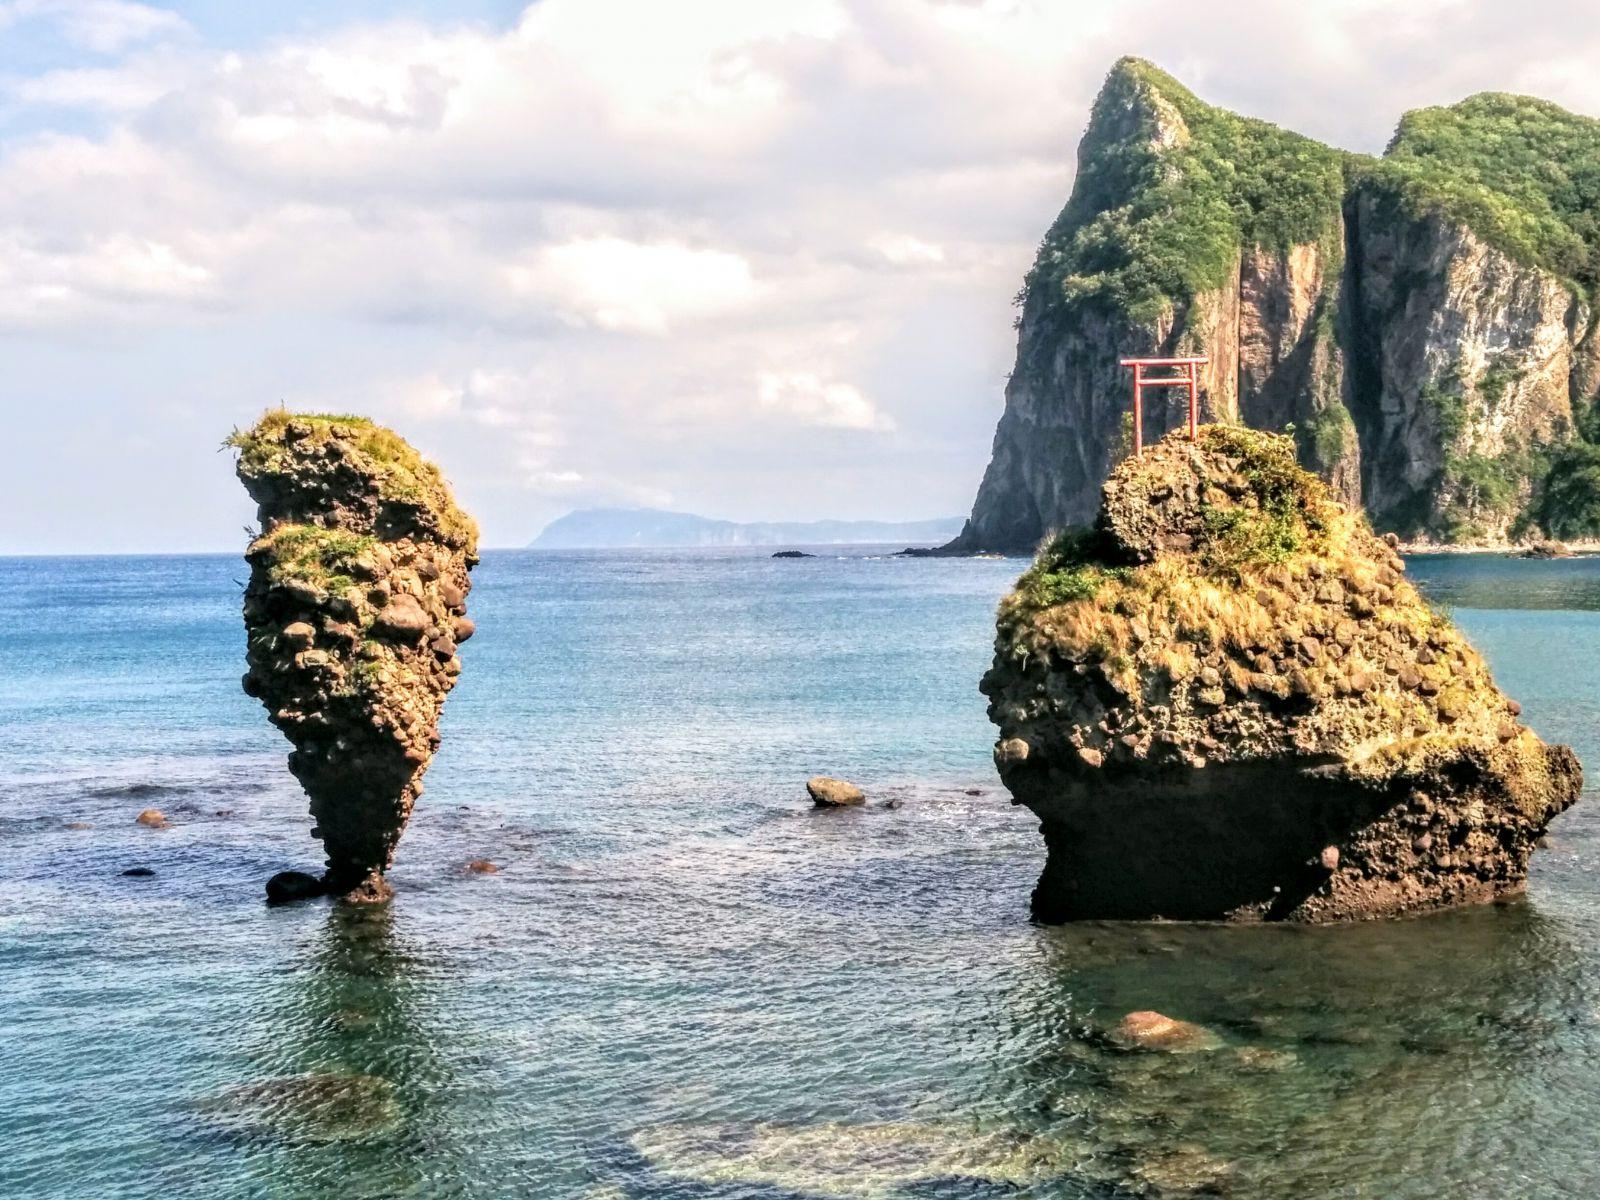 【積丹半島】余市町白岩地区・恵比寿岩と大黒岩観光案内です。